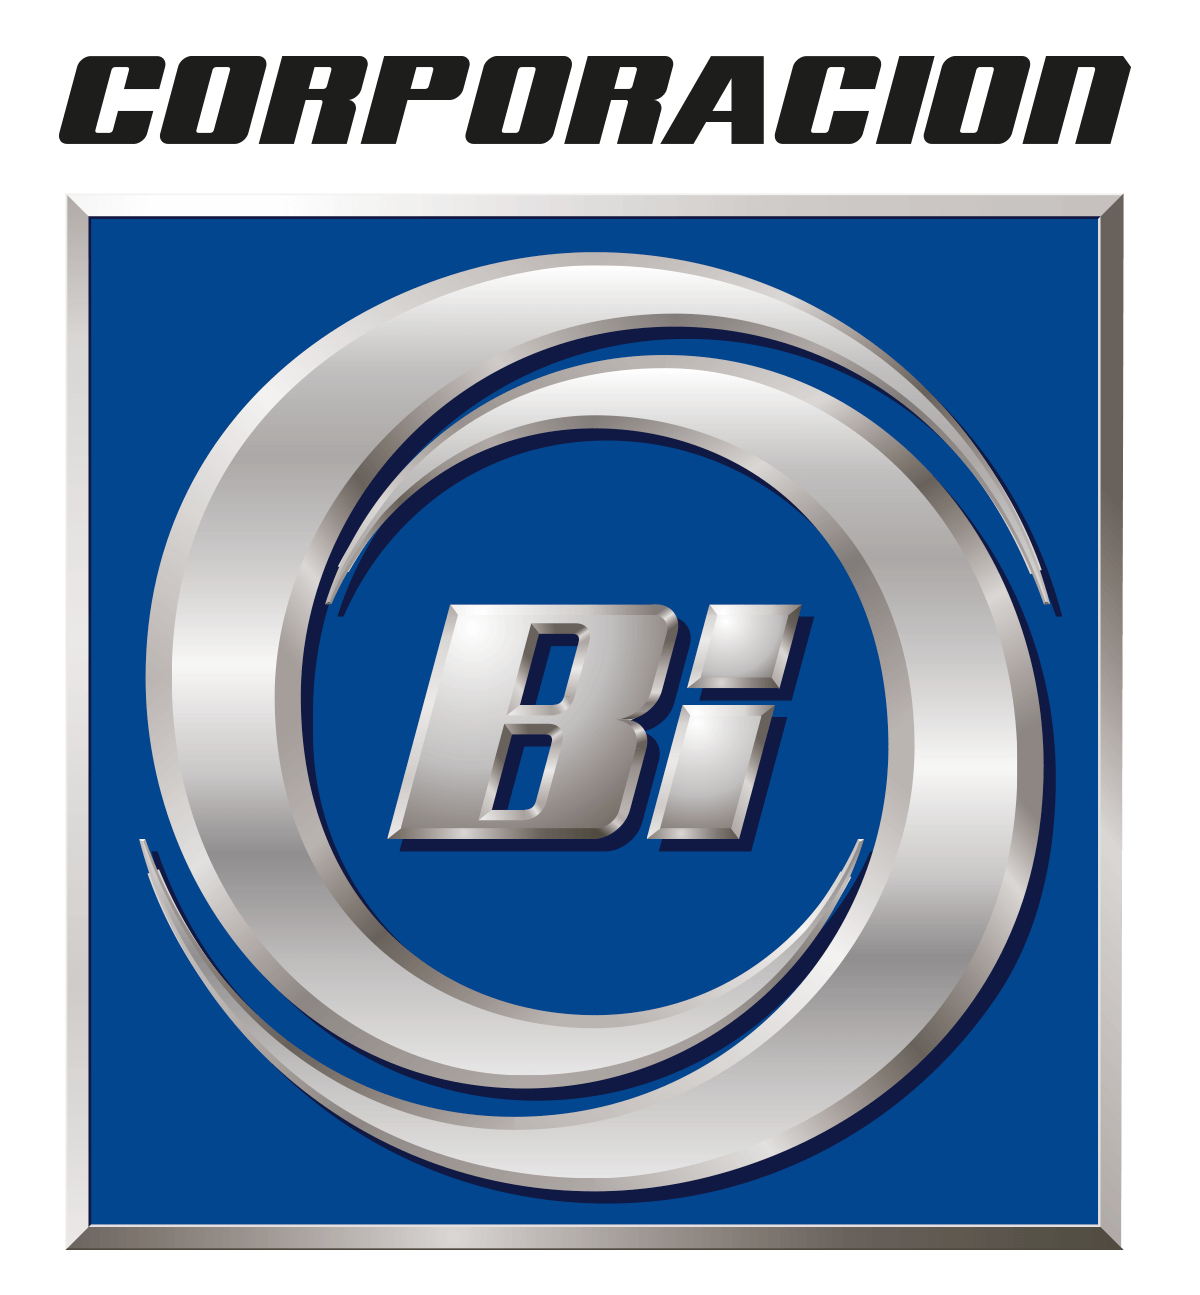 CORPORACION BI